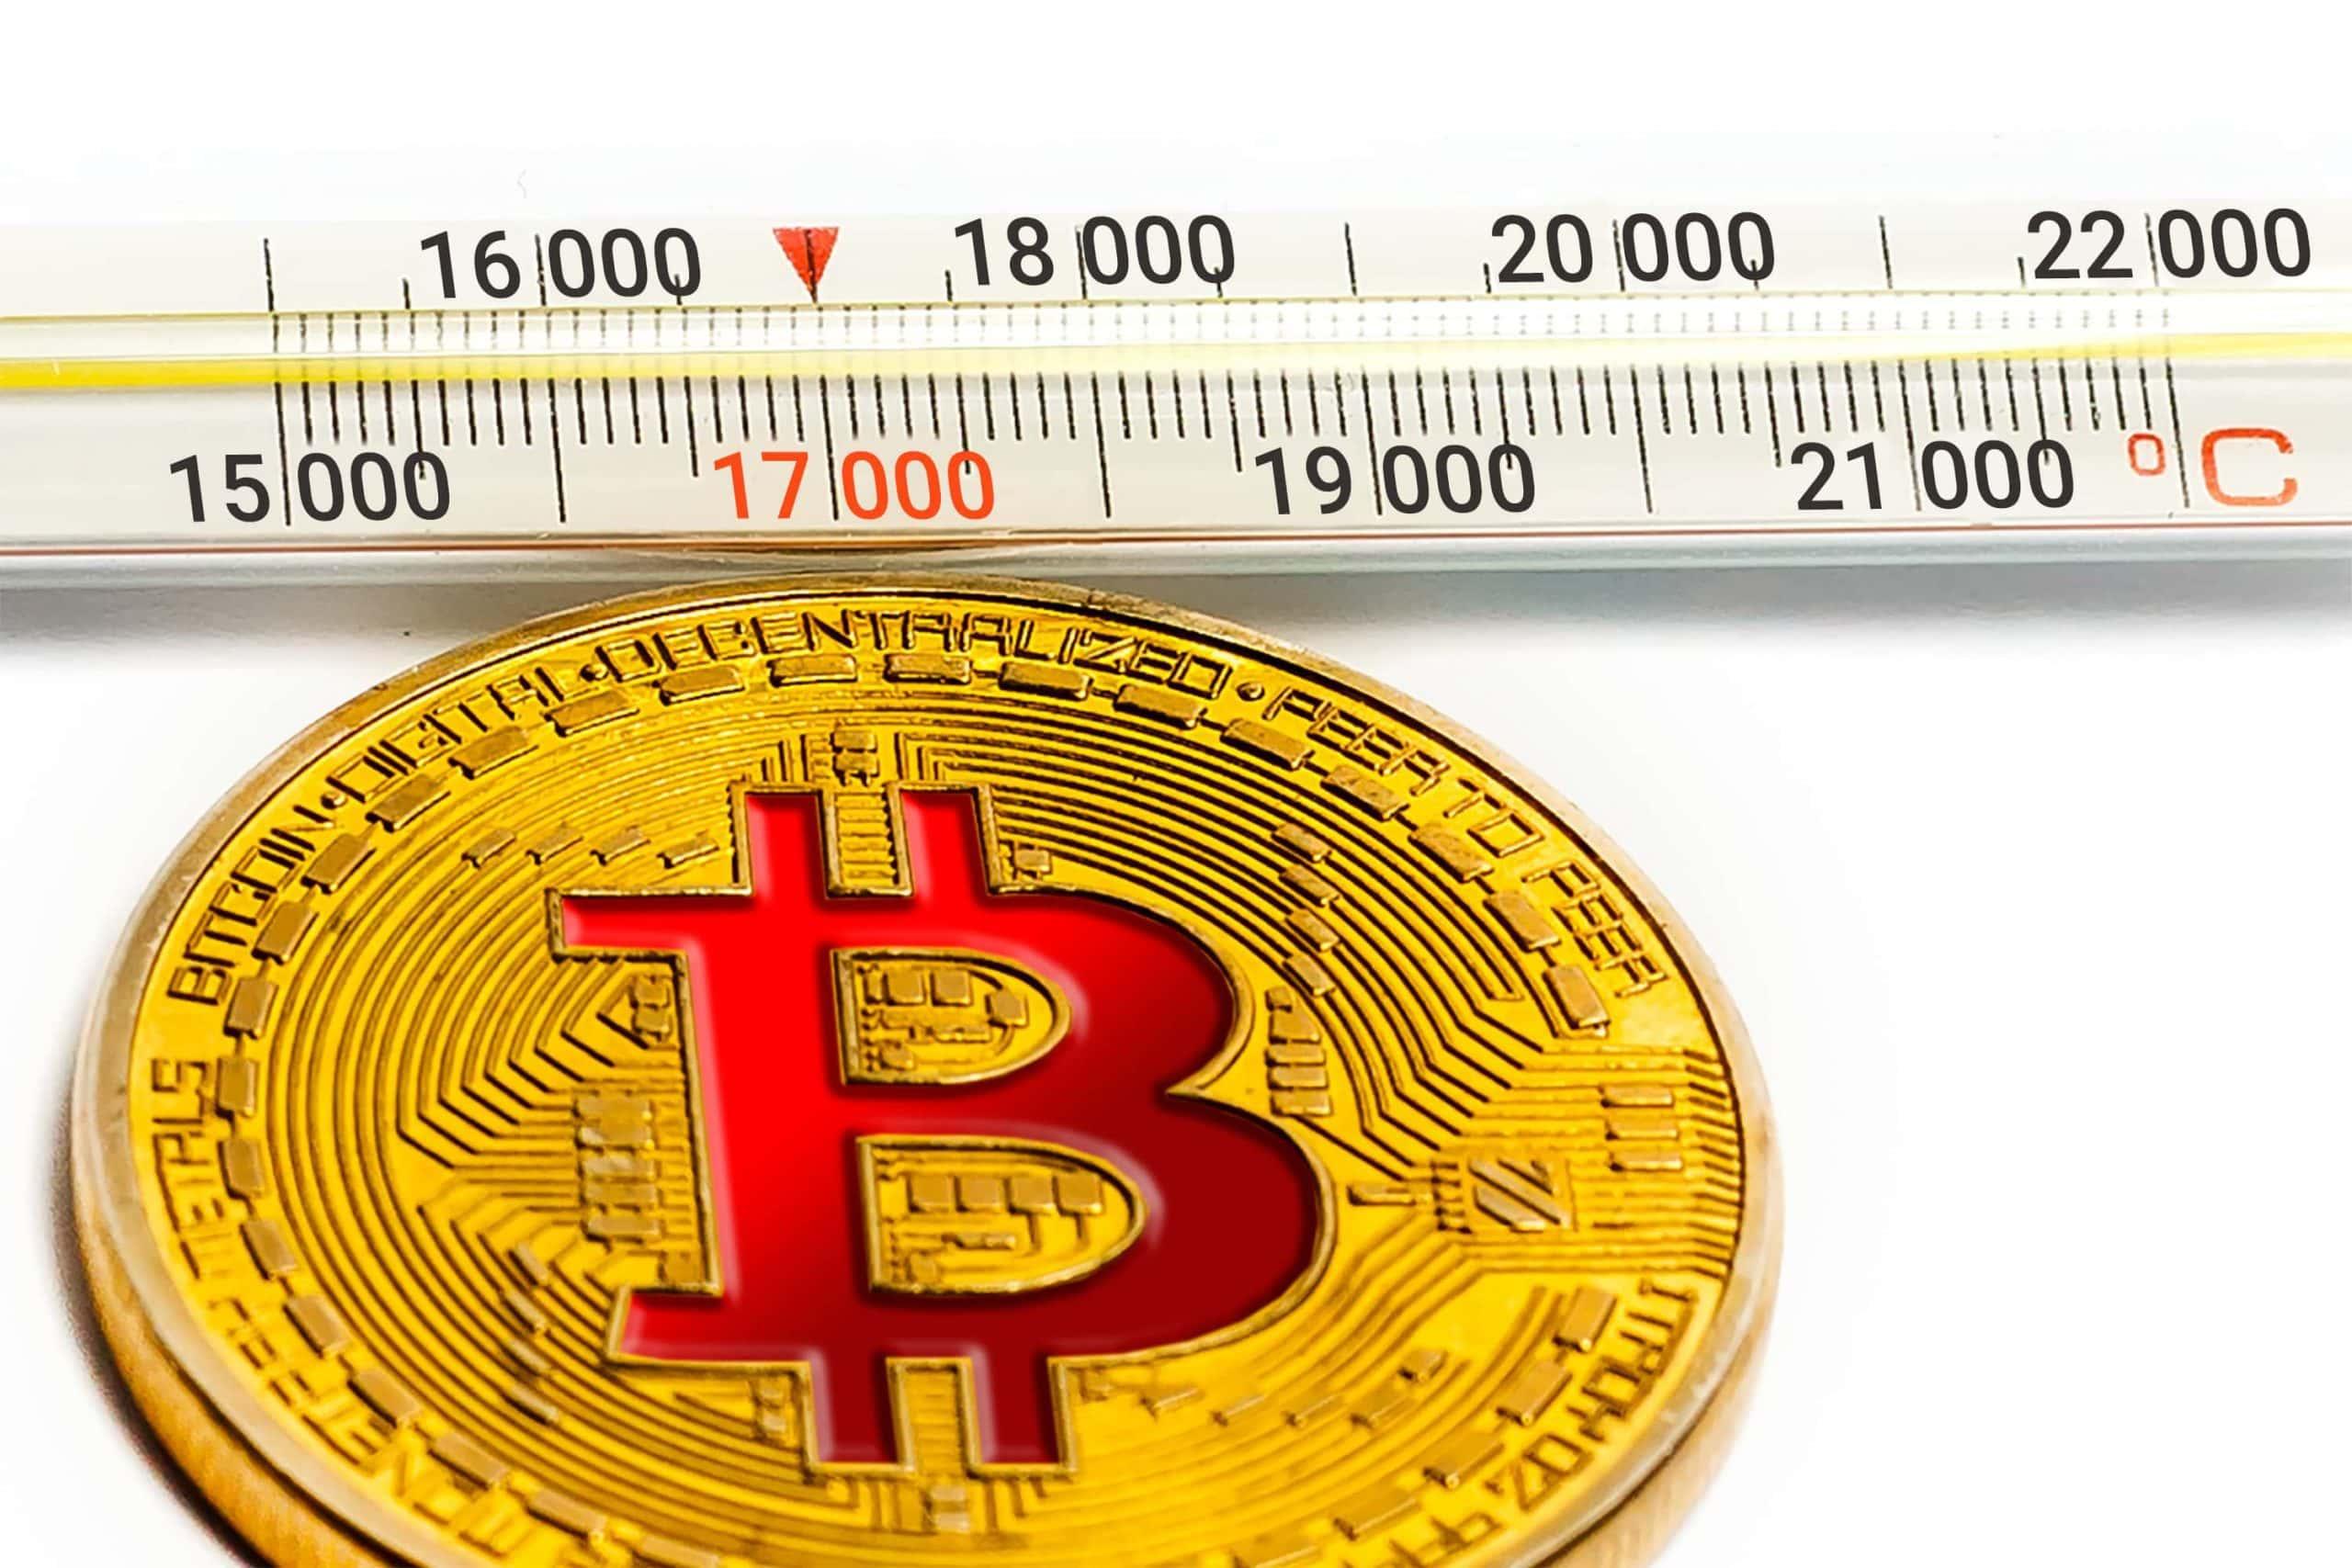 Bitcoin Münze mit 17.000 USD Marke